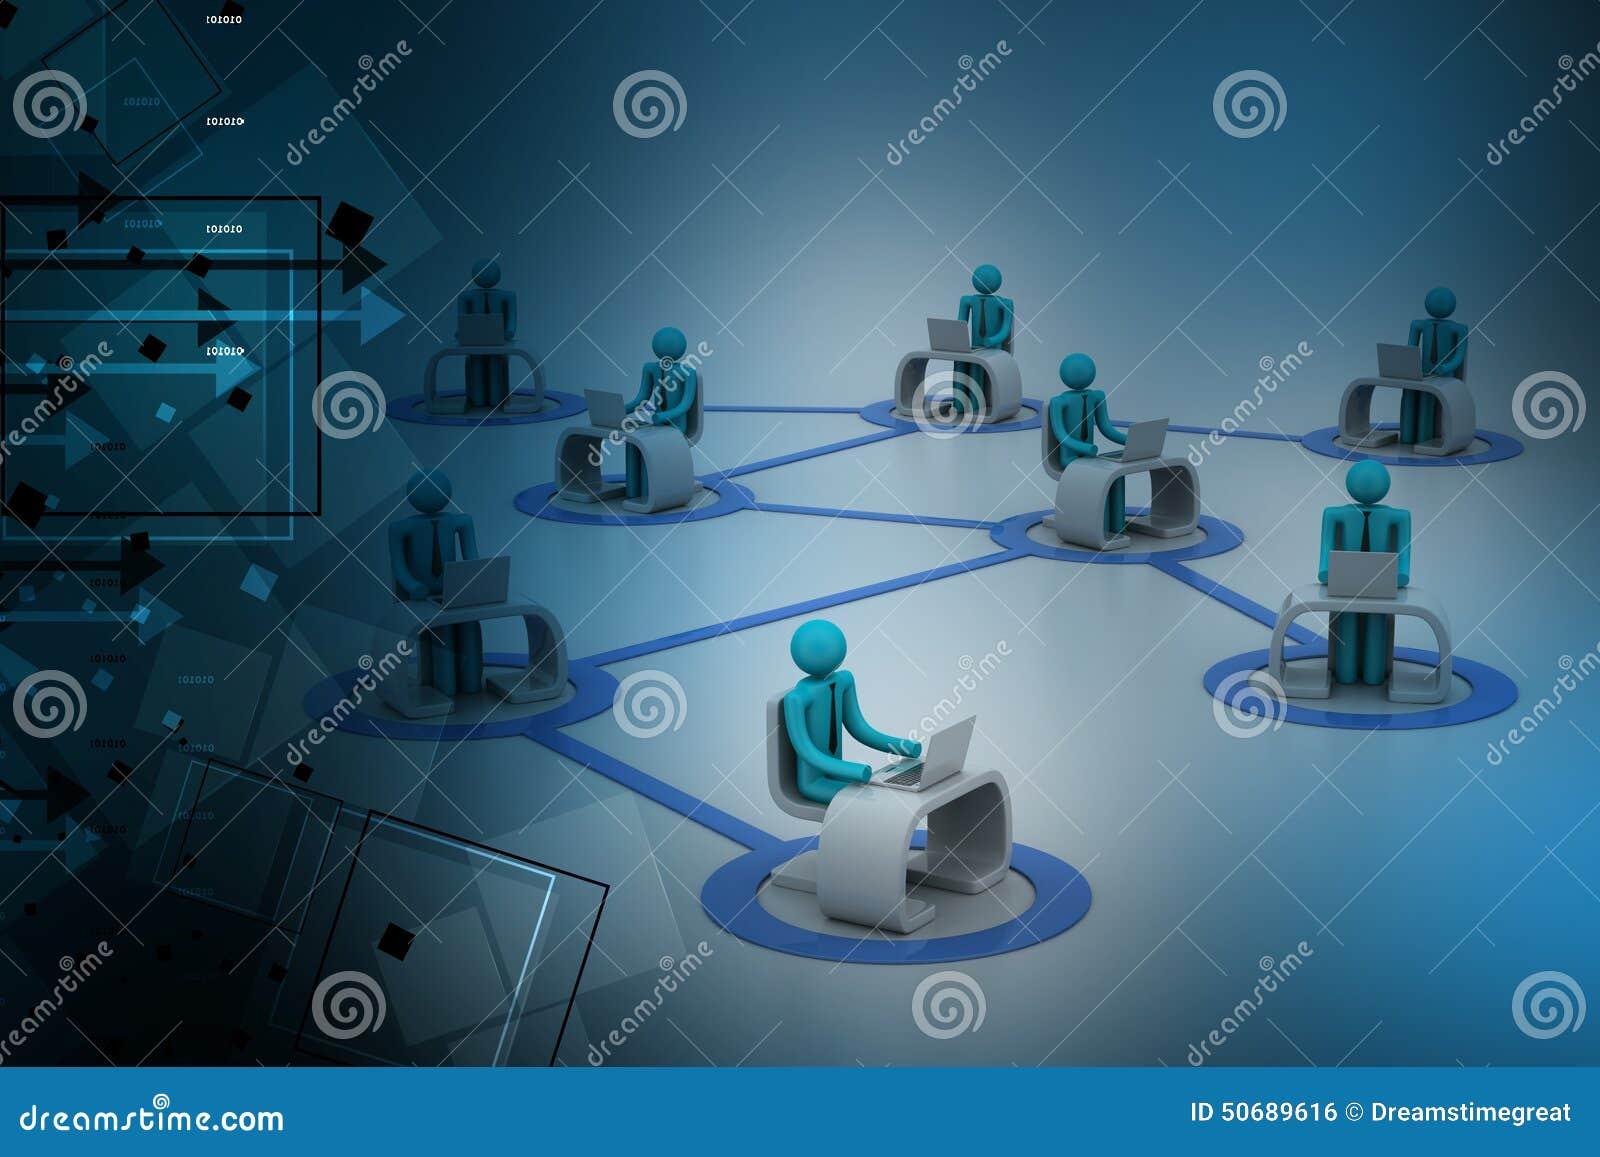 Download 营业通讯的概念 库存例证. 插画 包括有 雇佣, 论述, 会议, 商业, 椅子, d0, 当代, 人们, 研讨会 - 50689616